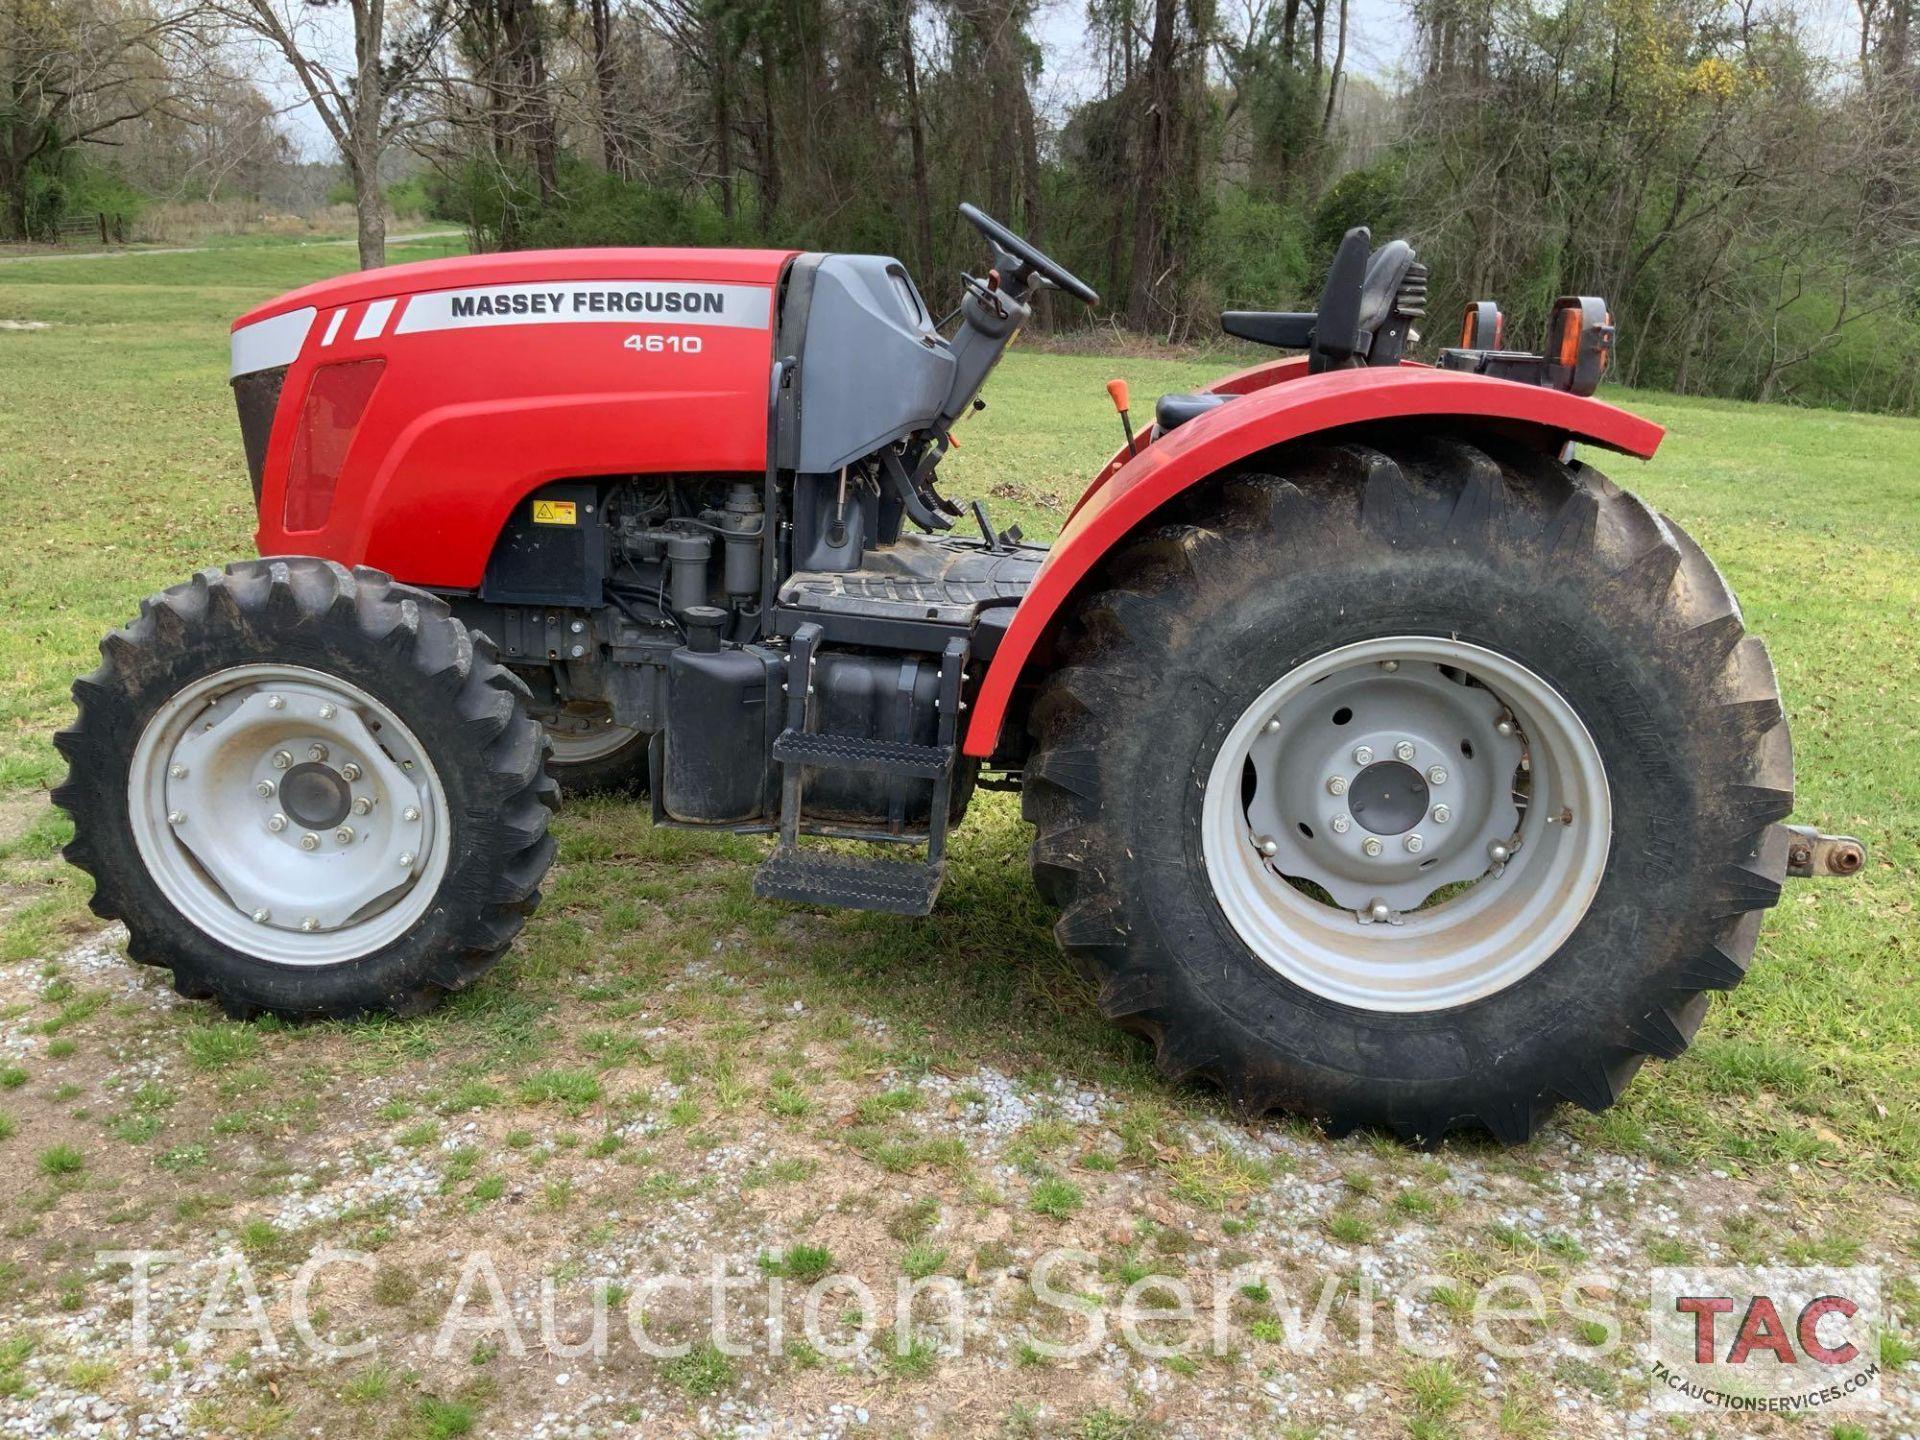 Massey-Ferguson 4610LP Farm Tractor - Image 3 of 26